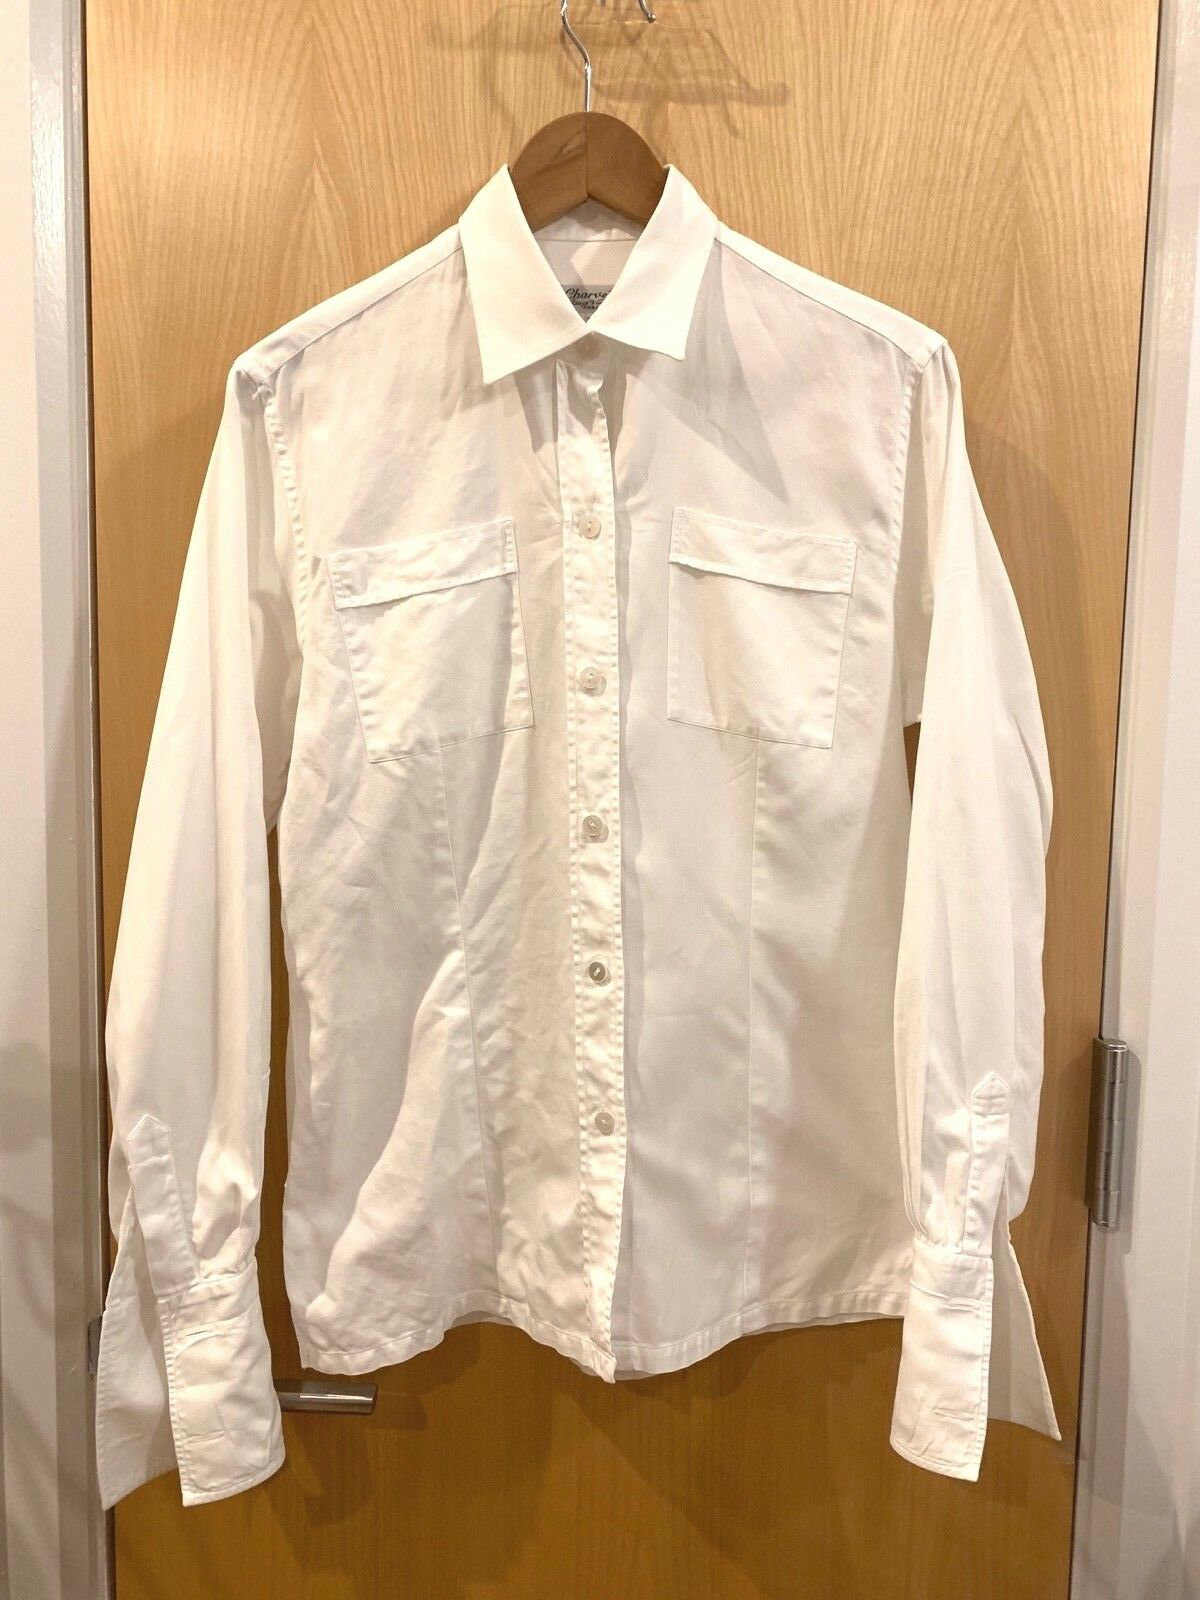 CHARVET DRESS SHIRT WHITE FRENCH CUFF WOMENS